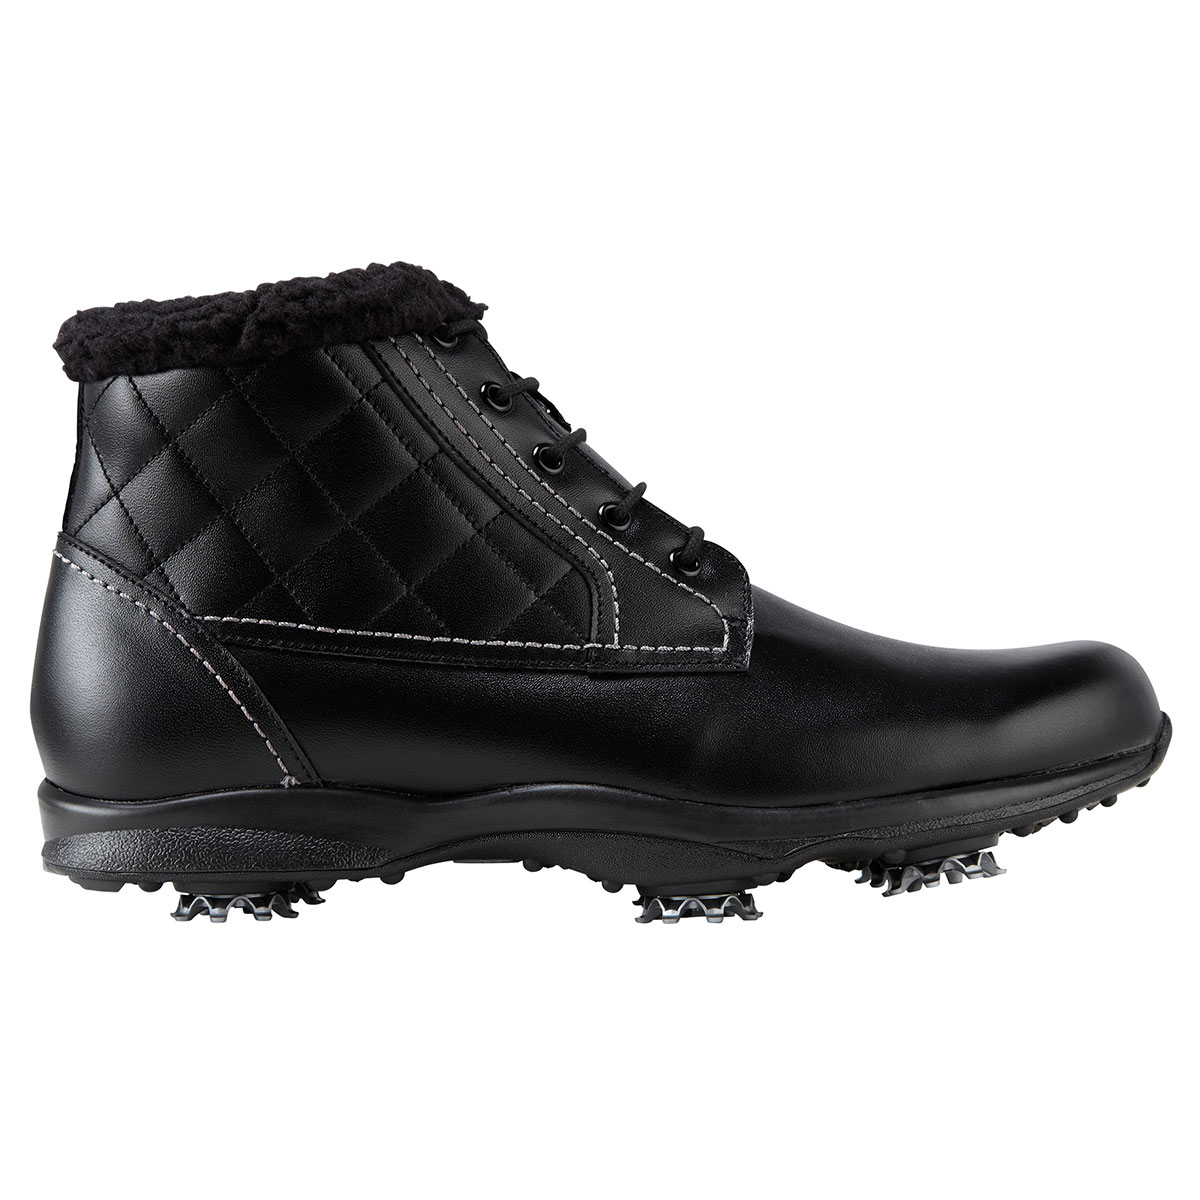 FootJoy Ladies Winter Boots   Online Golf